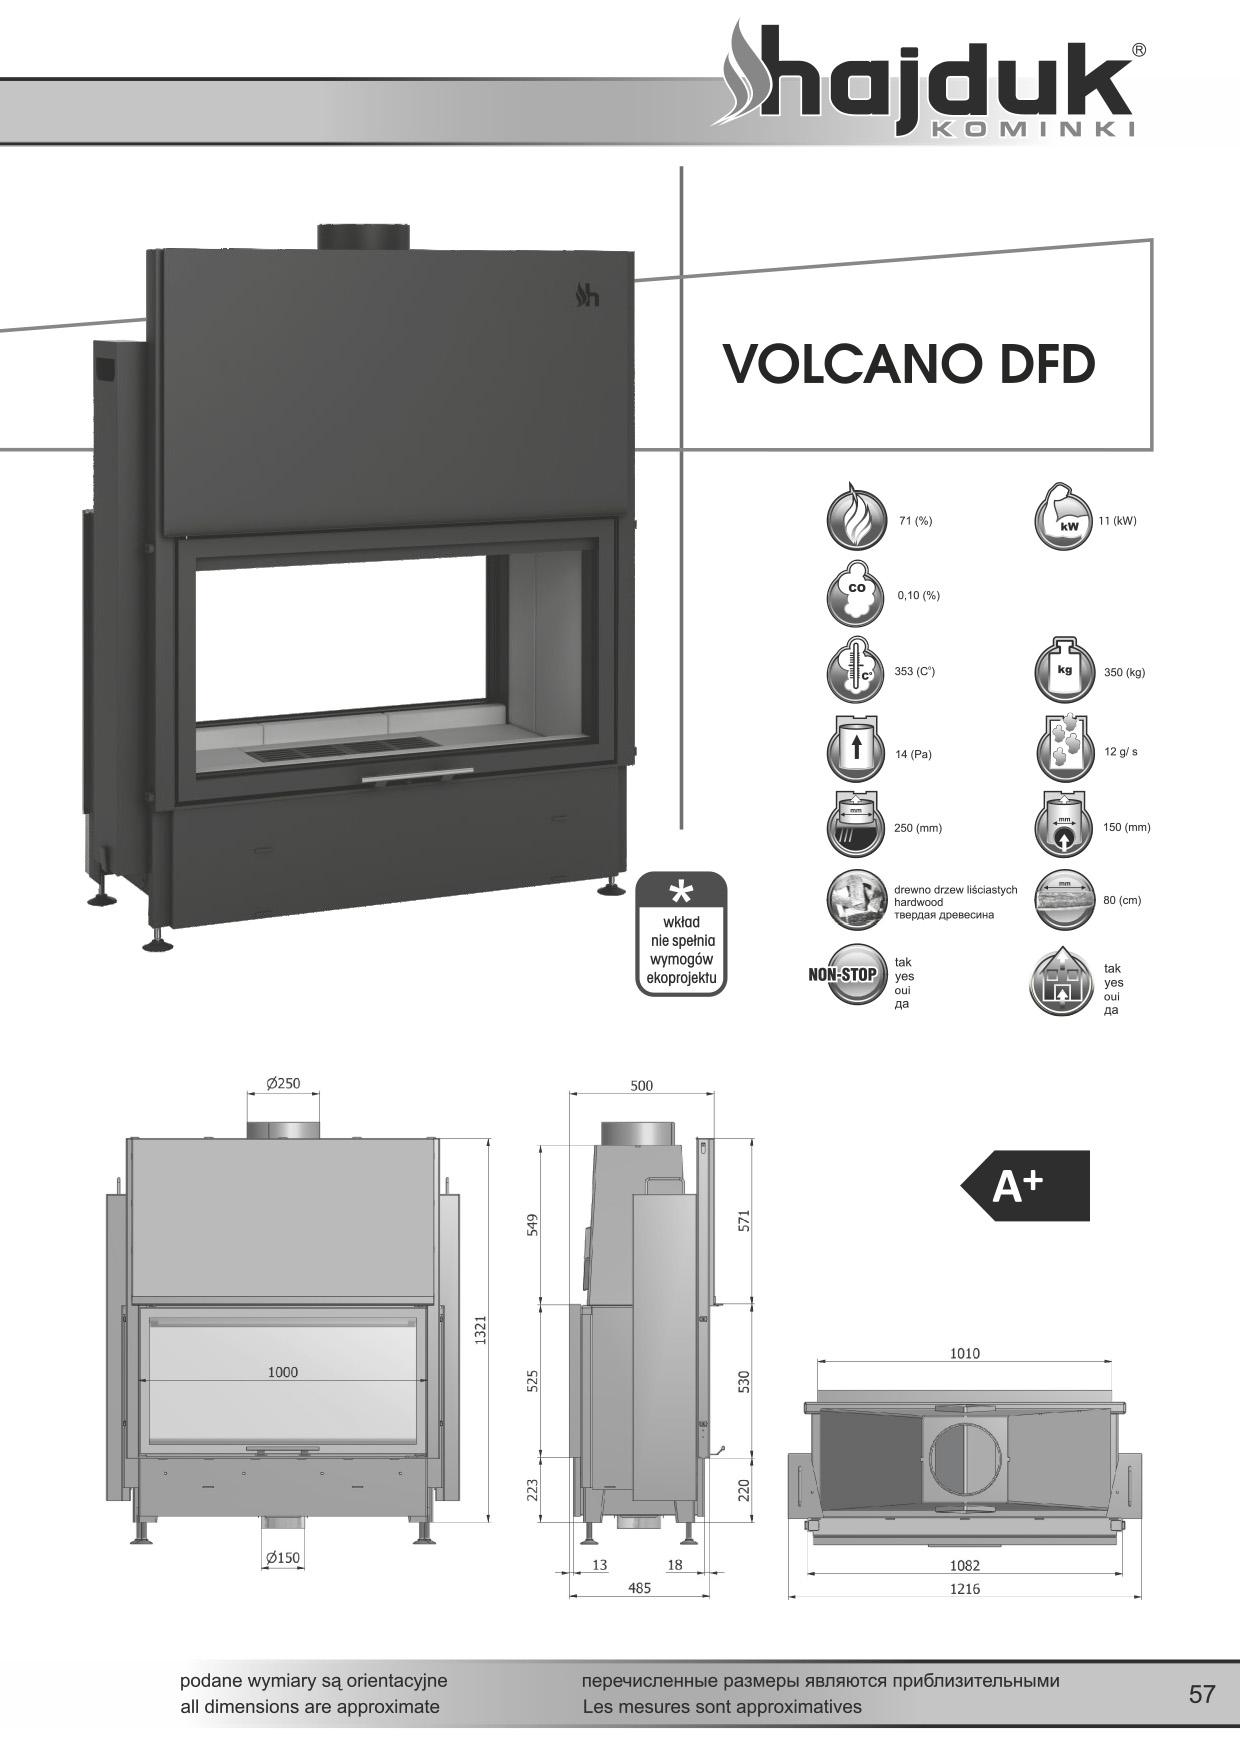 Volcano%20DFD%20 %20karta%20techniczna - Fireplace insert Hajduk Volcano DFD